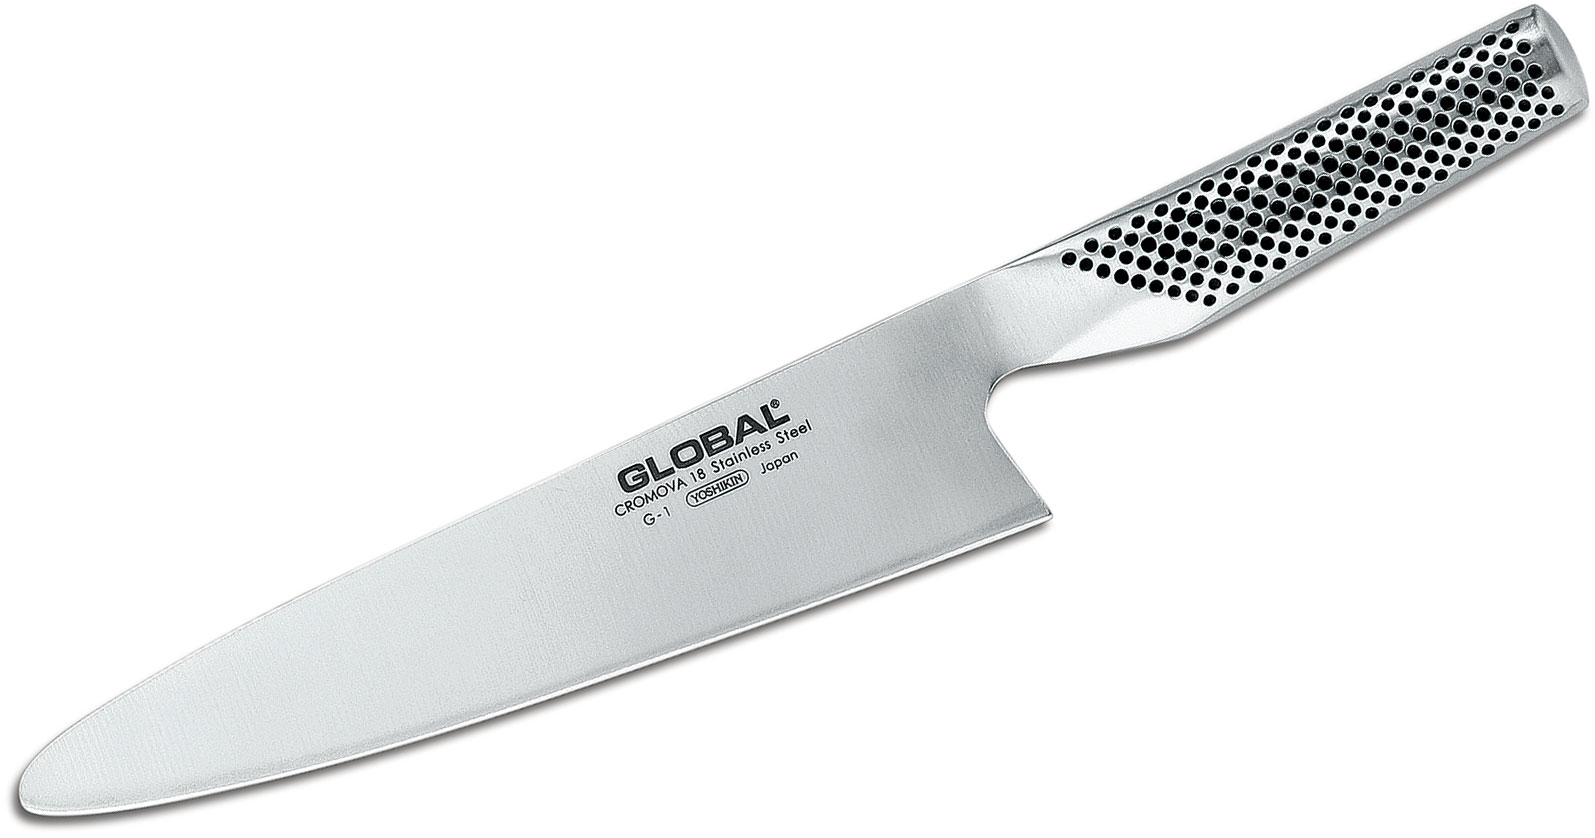 Global G-1 Classic 8 inch Slicing Knife